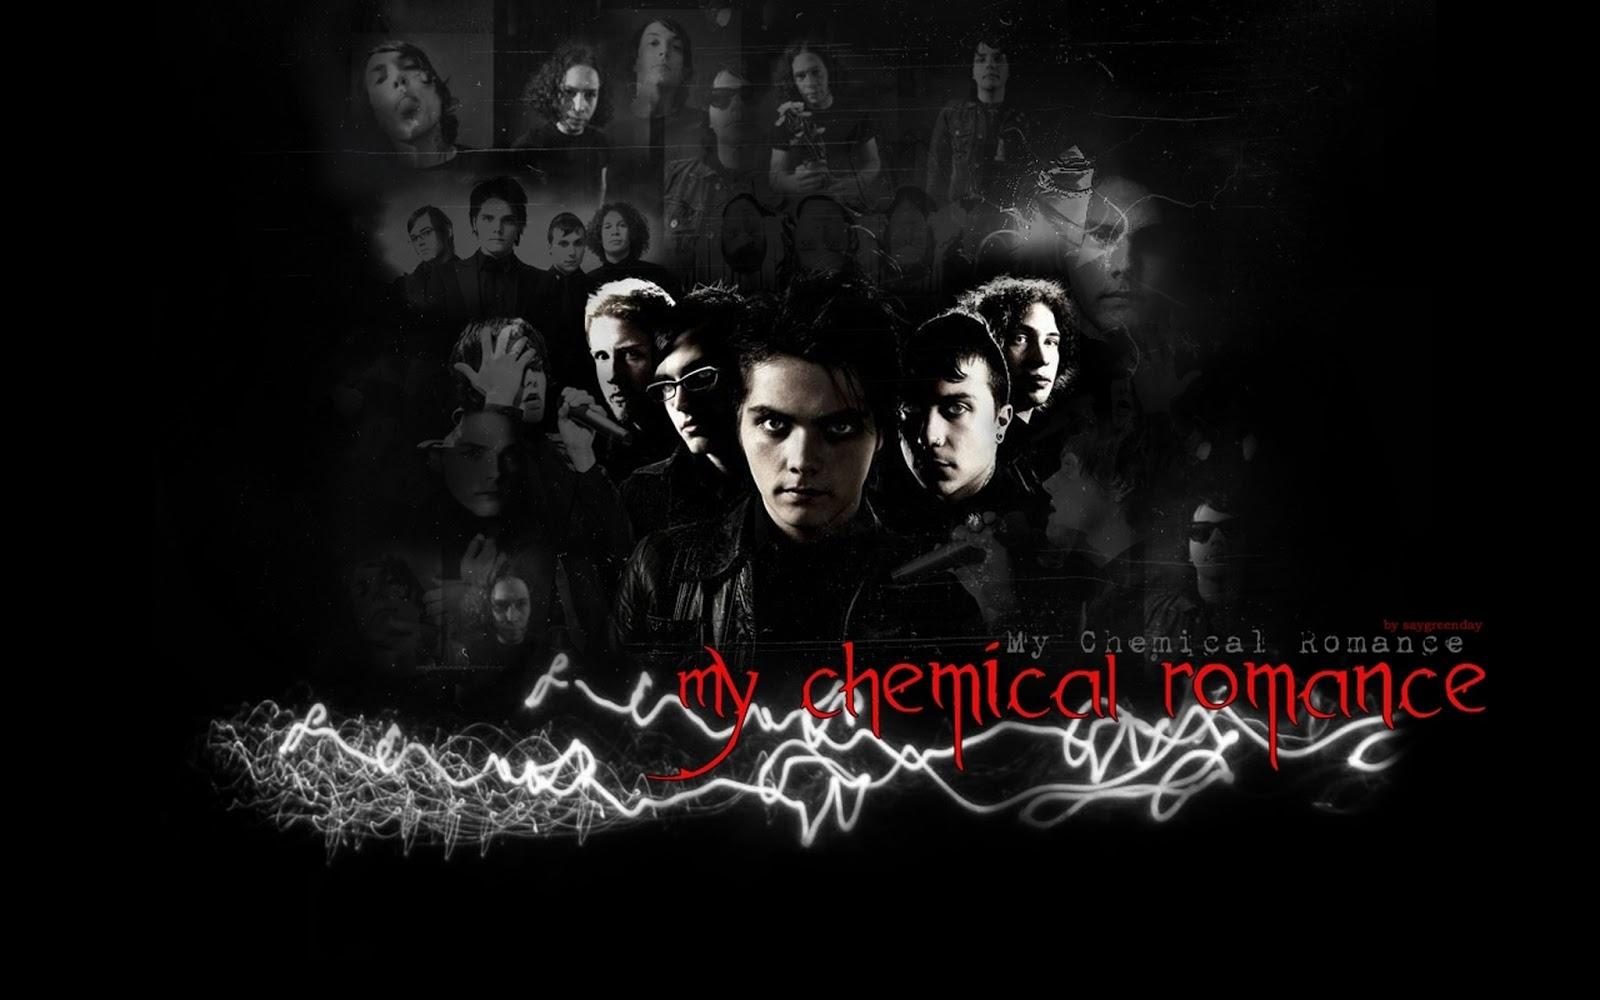 My Chemical Romance Wallpaper 2